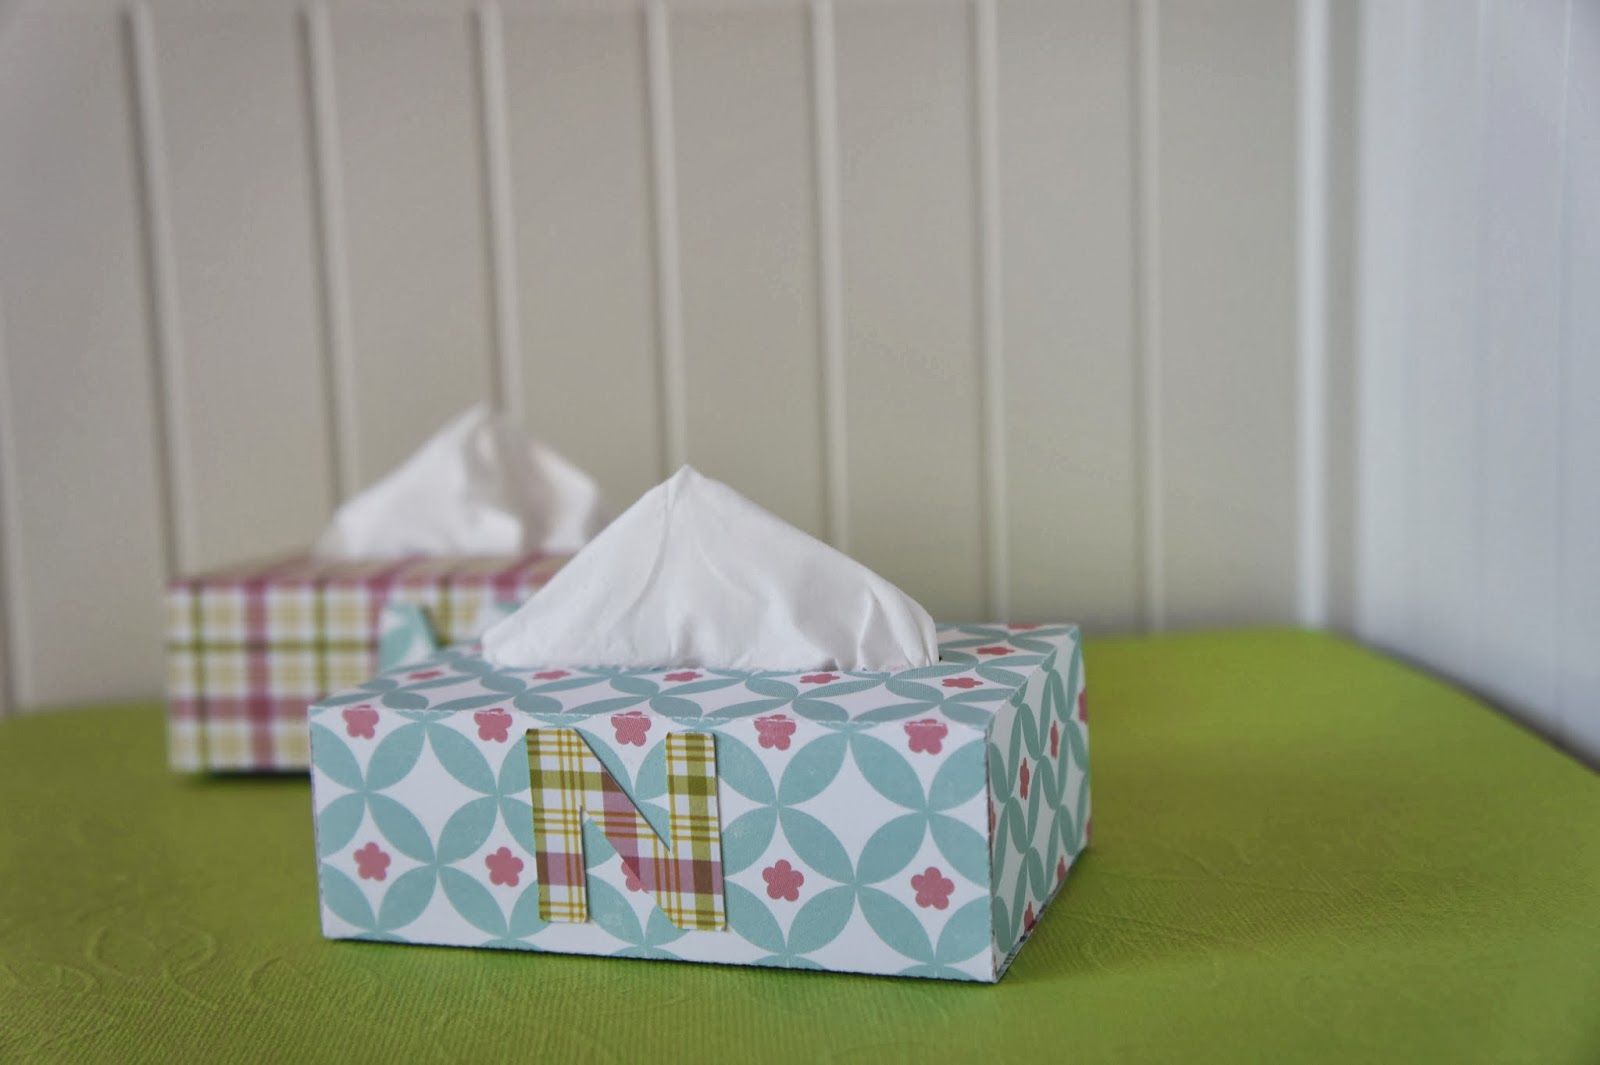 Cajas de pañuelos de papel